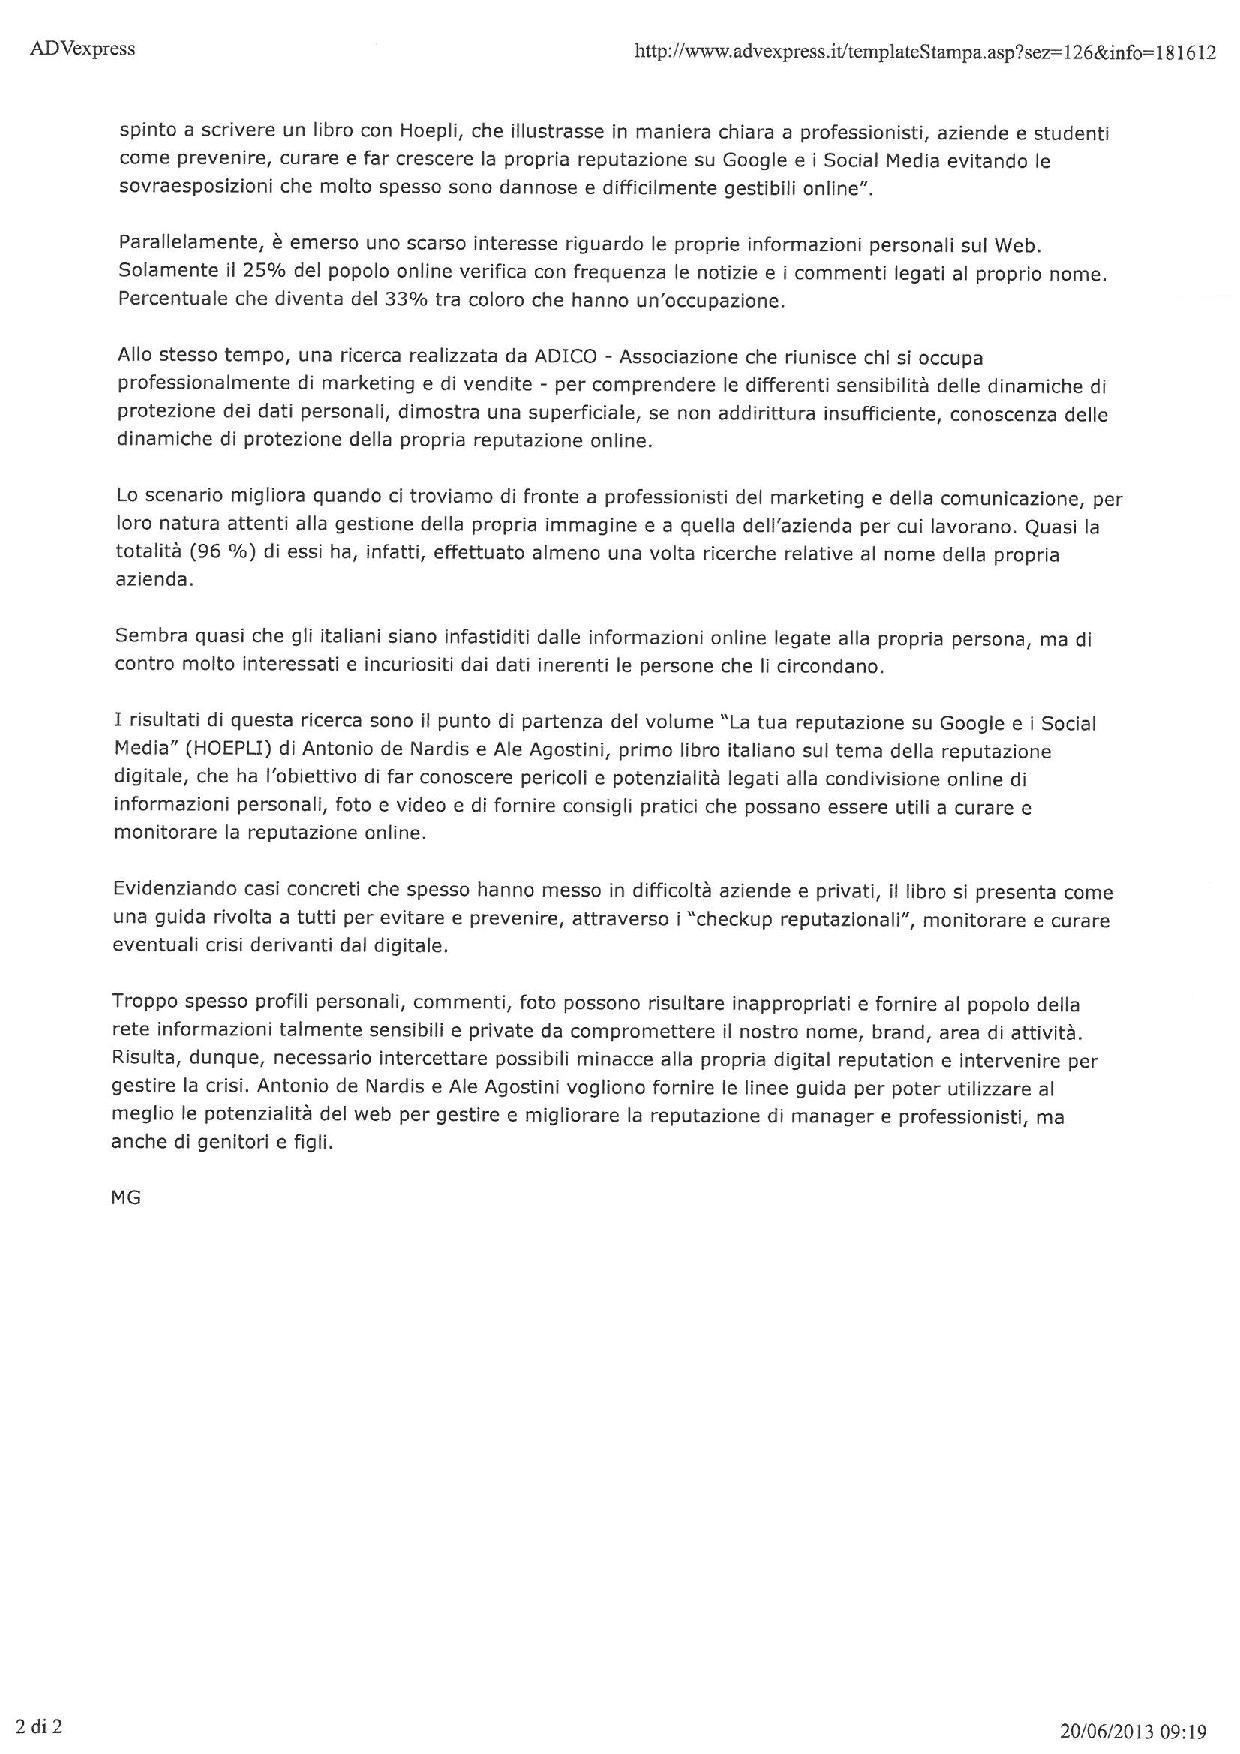 19.06.2013 Advexpress.it.pdf-002